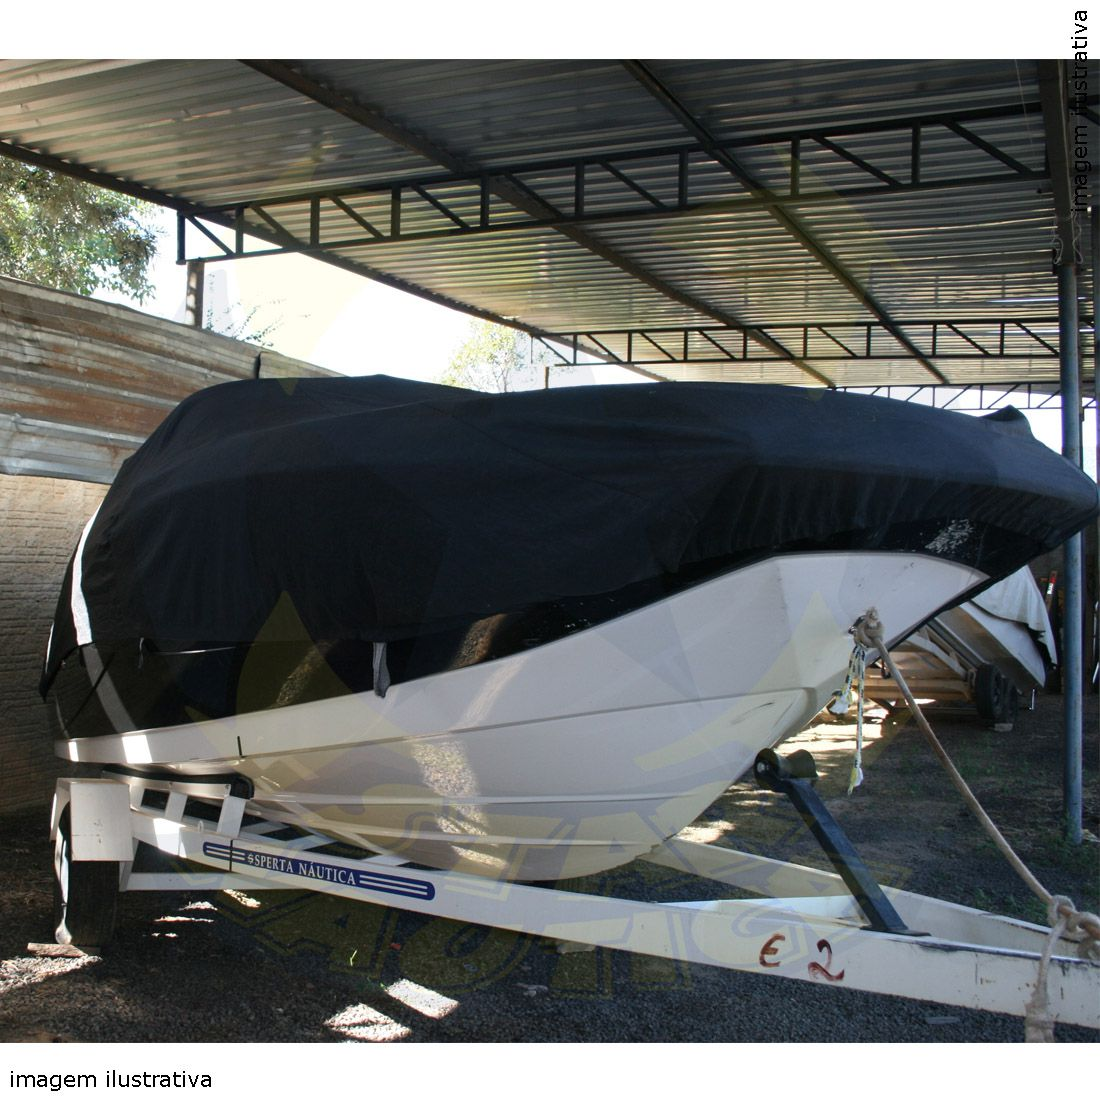 Capa Lona de Cobertura Lancha FS 230 Sirena ou Scapare Lona Emborrachada